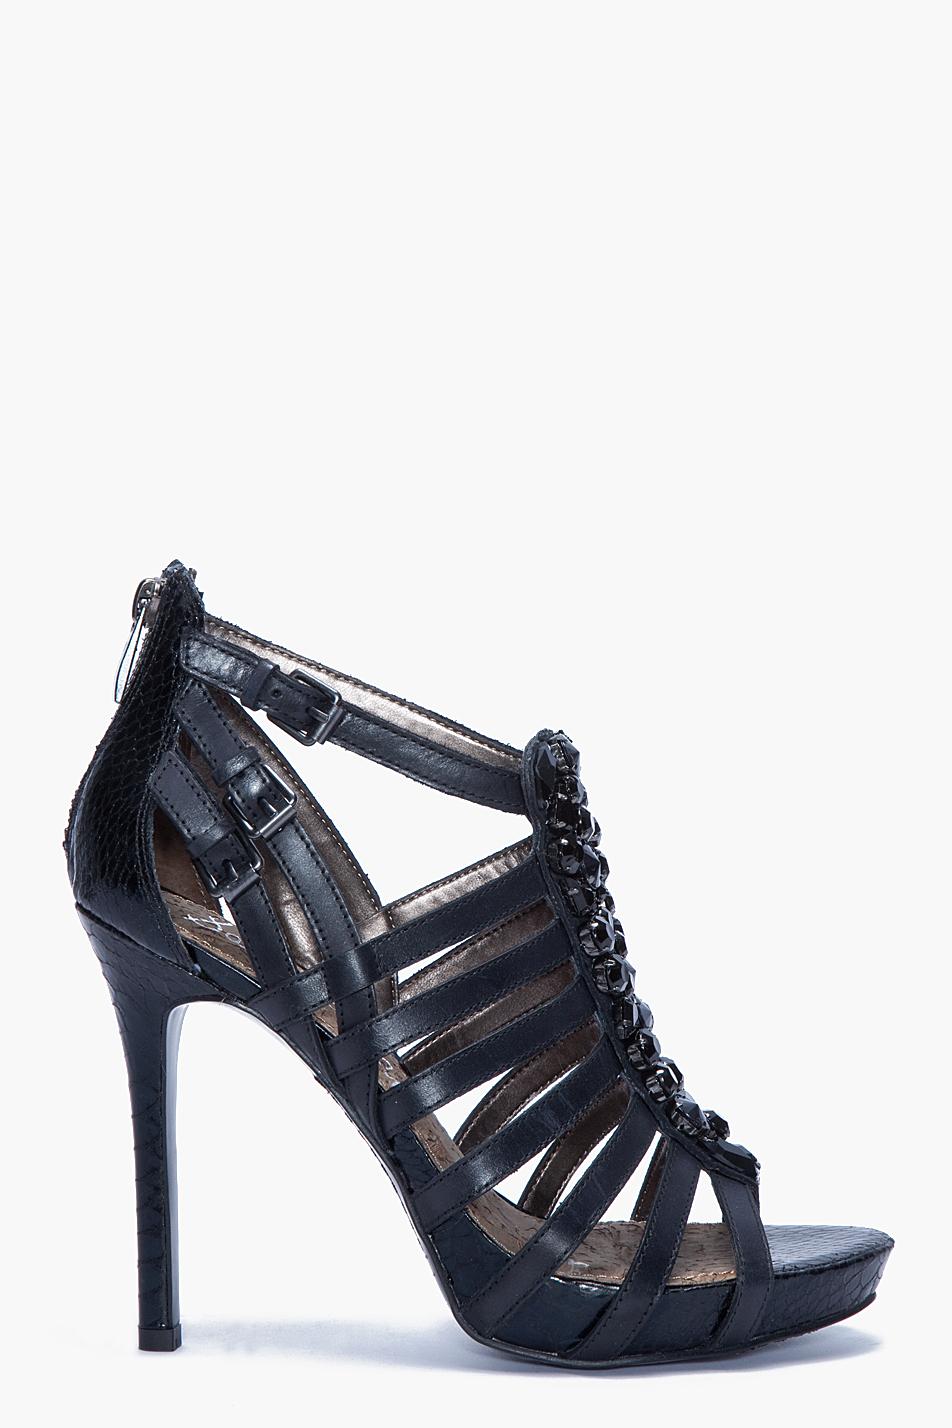 Sam Edelman Quintessa Heels In Black Lyst